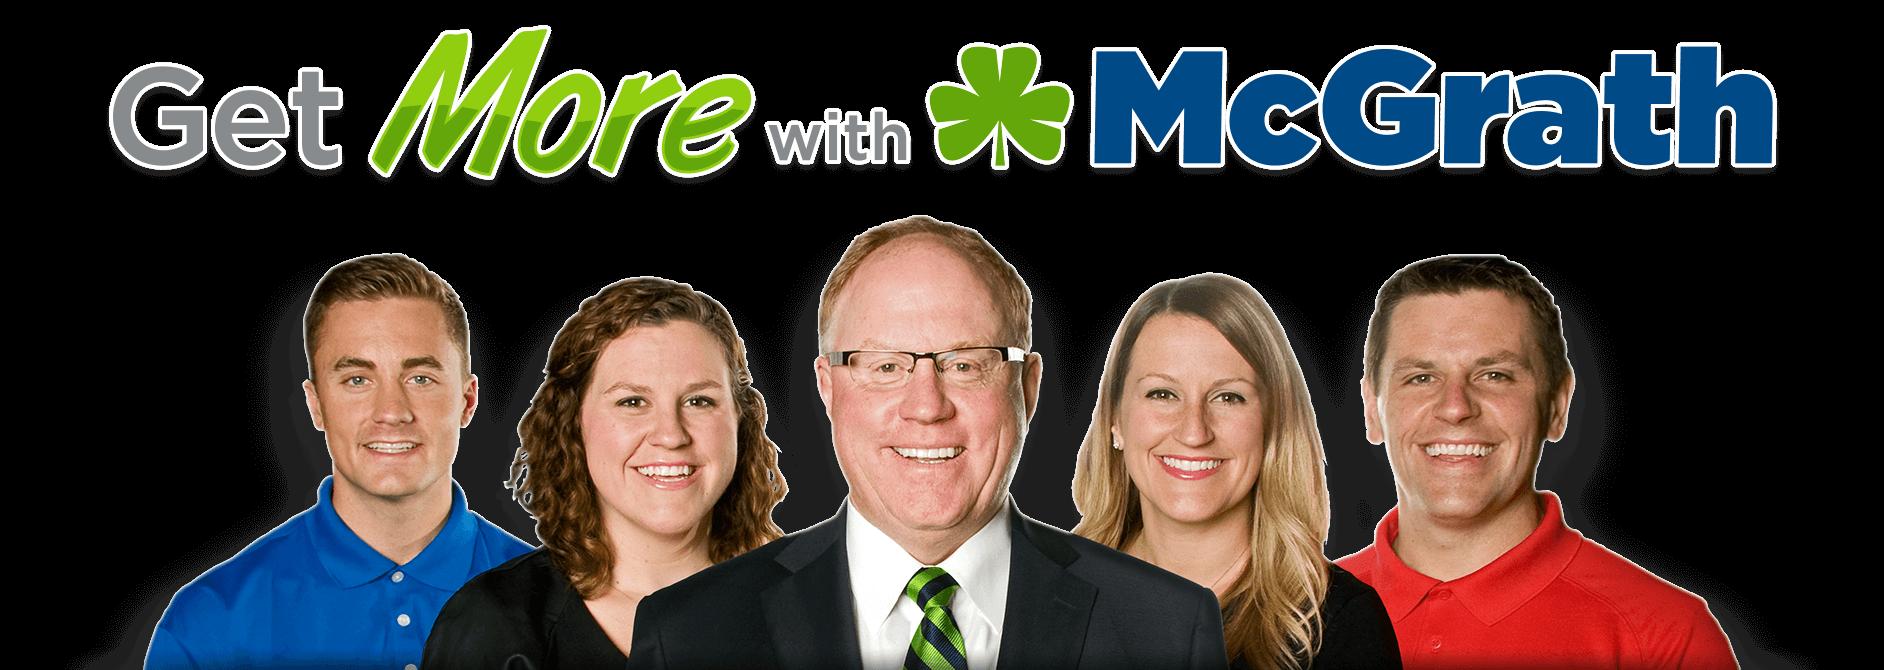 Get More with McGrath